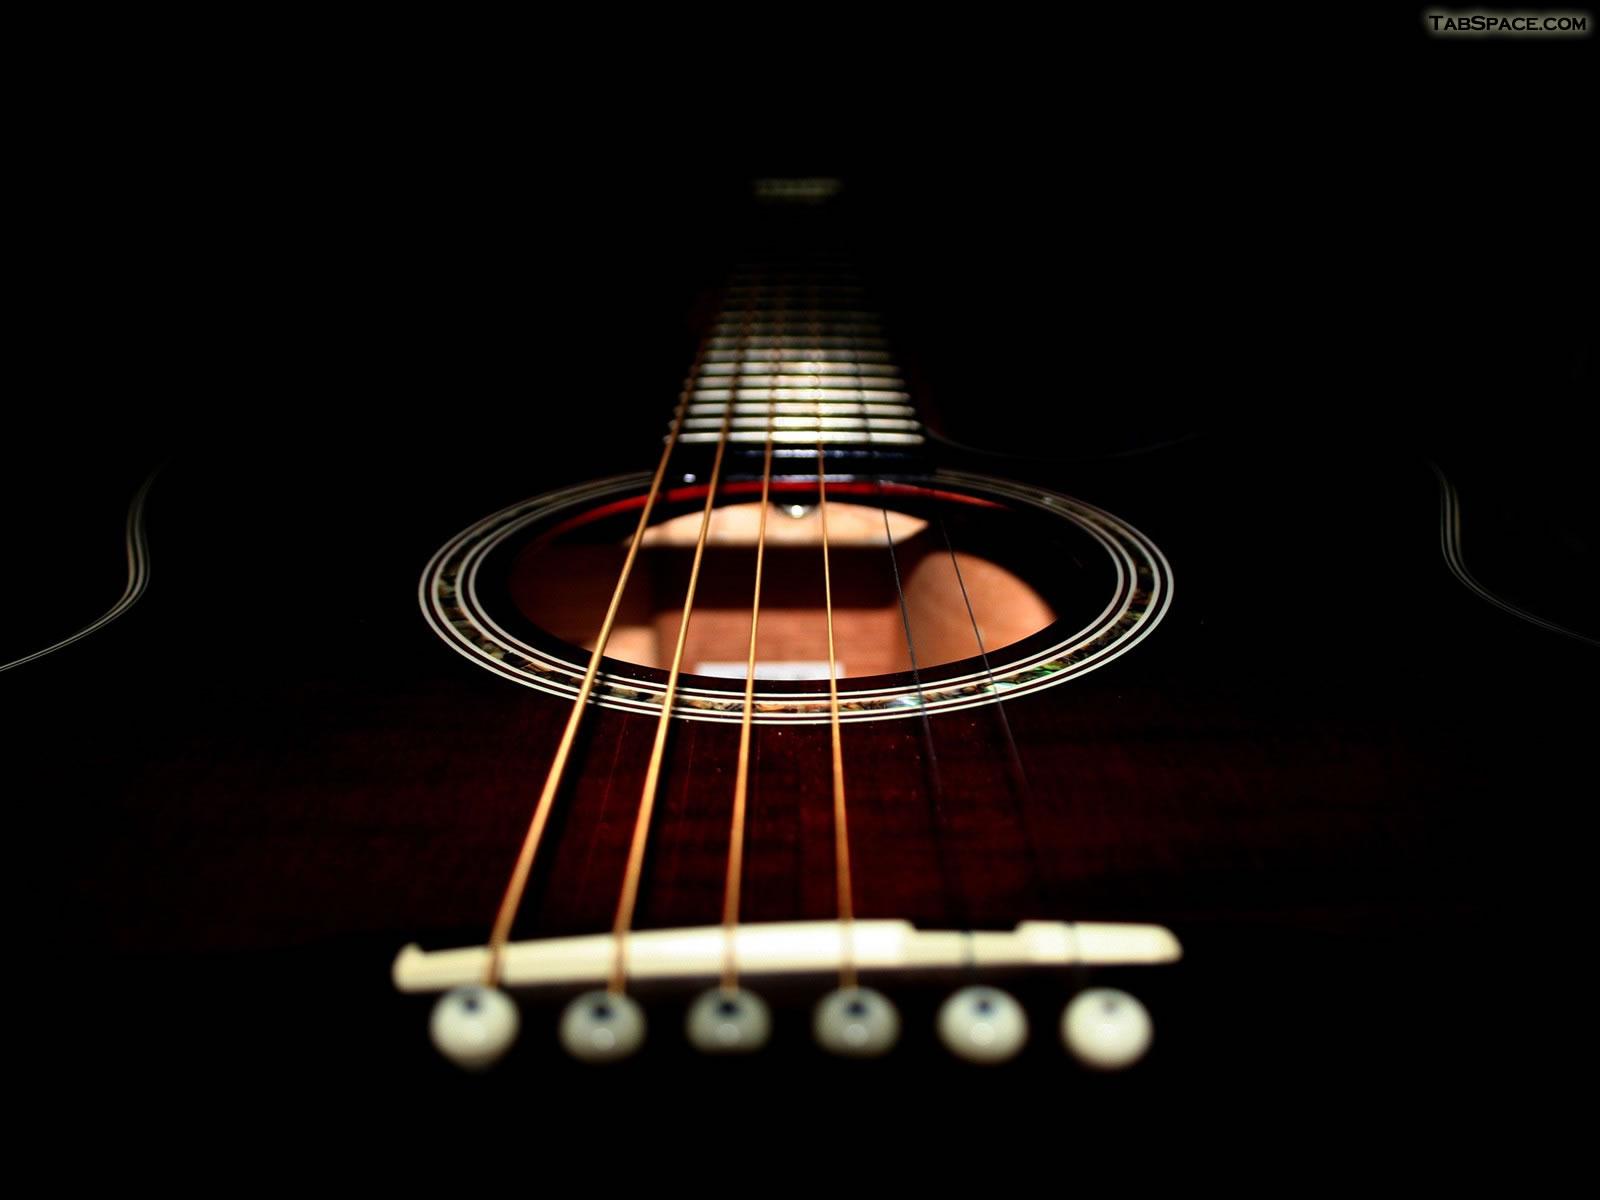 Top Wallpaper Love Guitar - guitar_wallpaper_2-s1600x1200-63209  Collection_25597.jpg